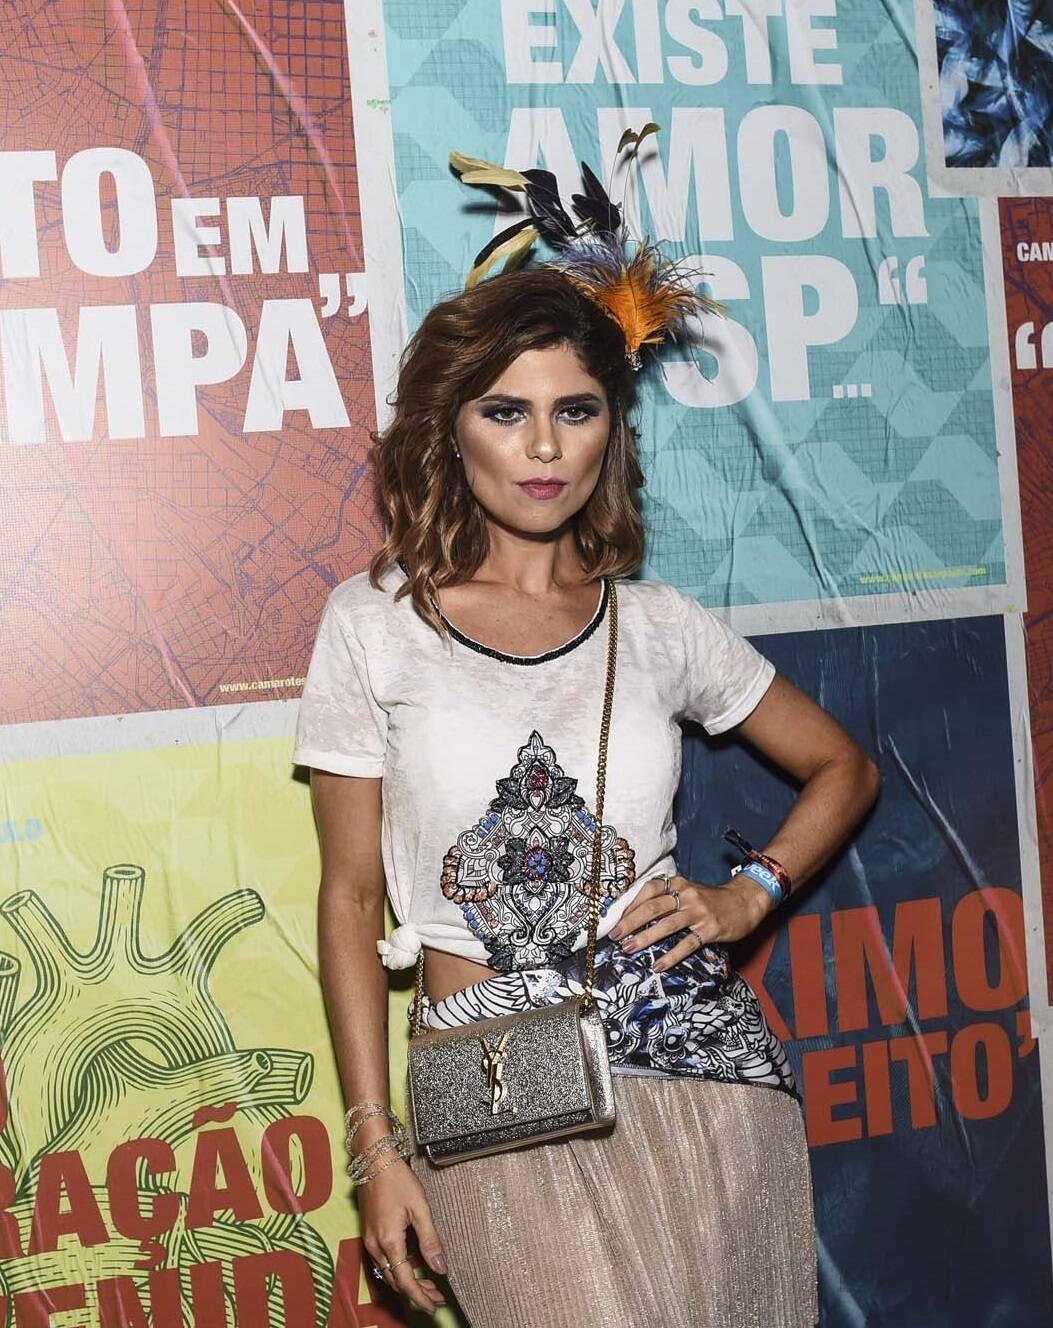 Julianne Trevisol no Camarote São Paulo no Anhembi na sexta (09). Foto: Lu Prezia